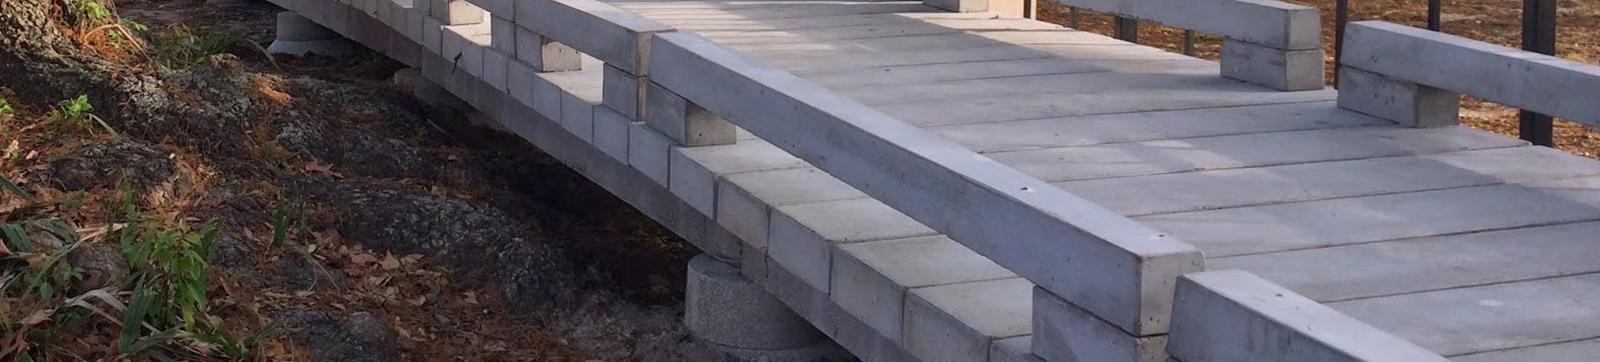 boardwalk-construction-precast-concrete-piers-top.jpg